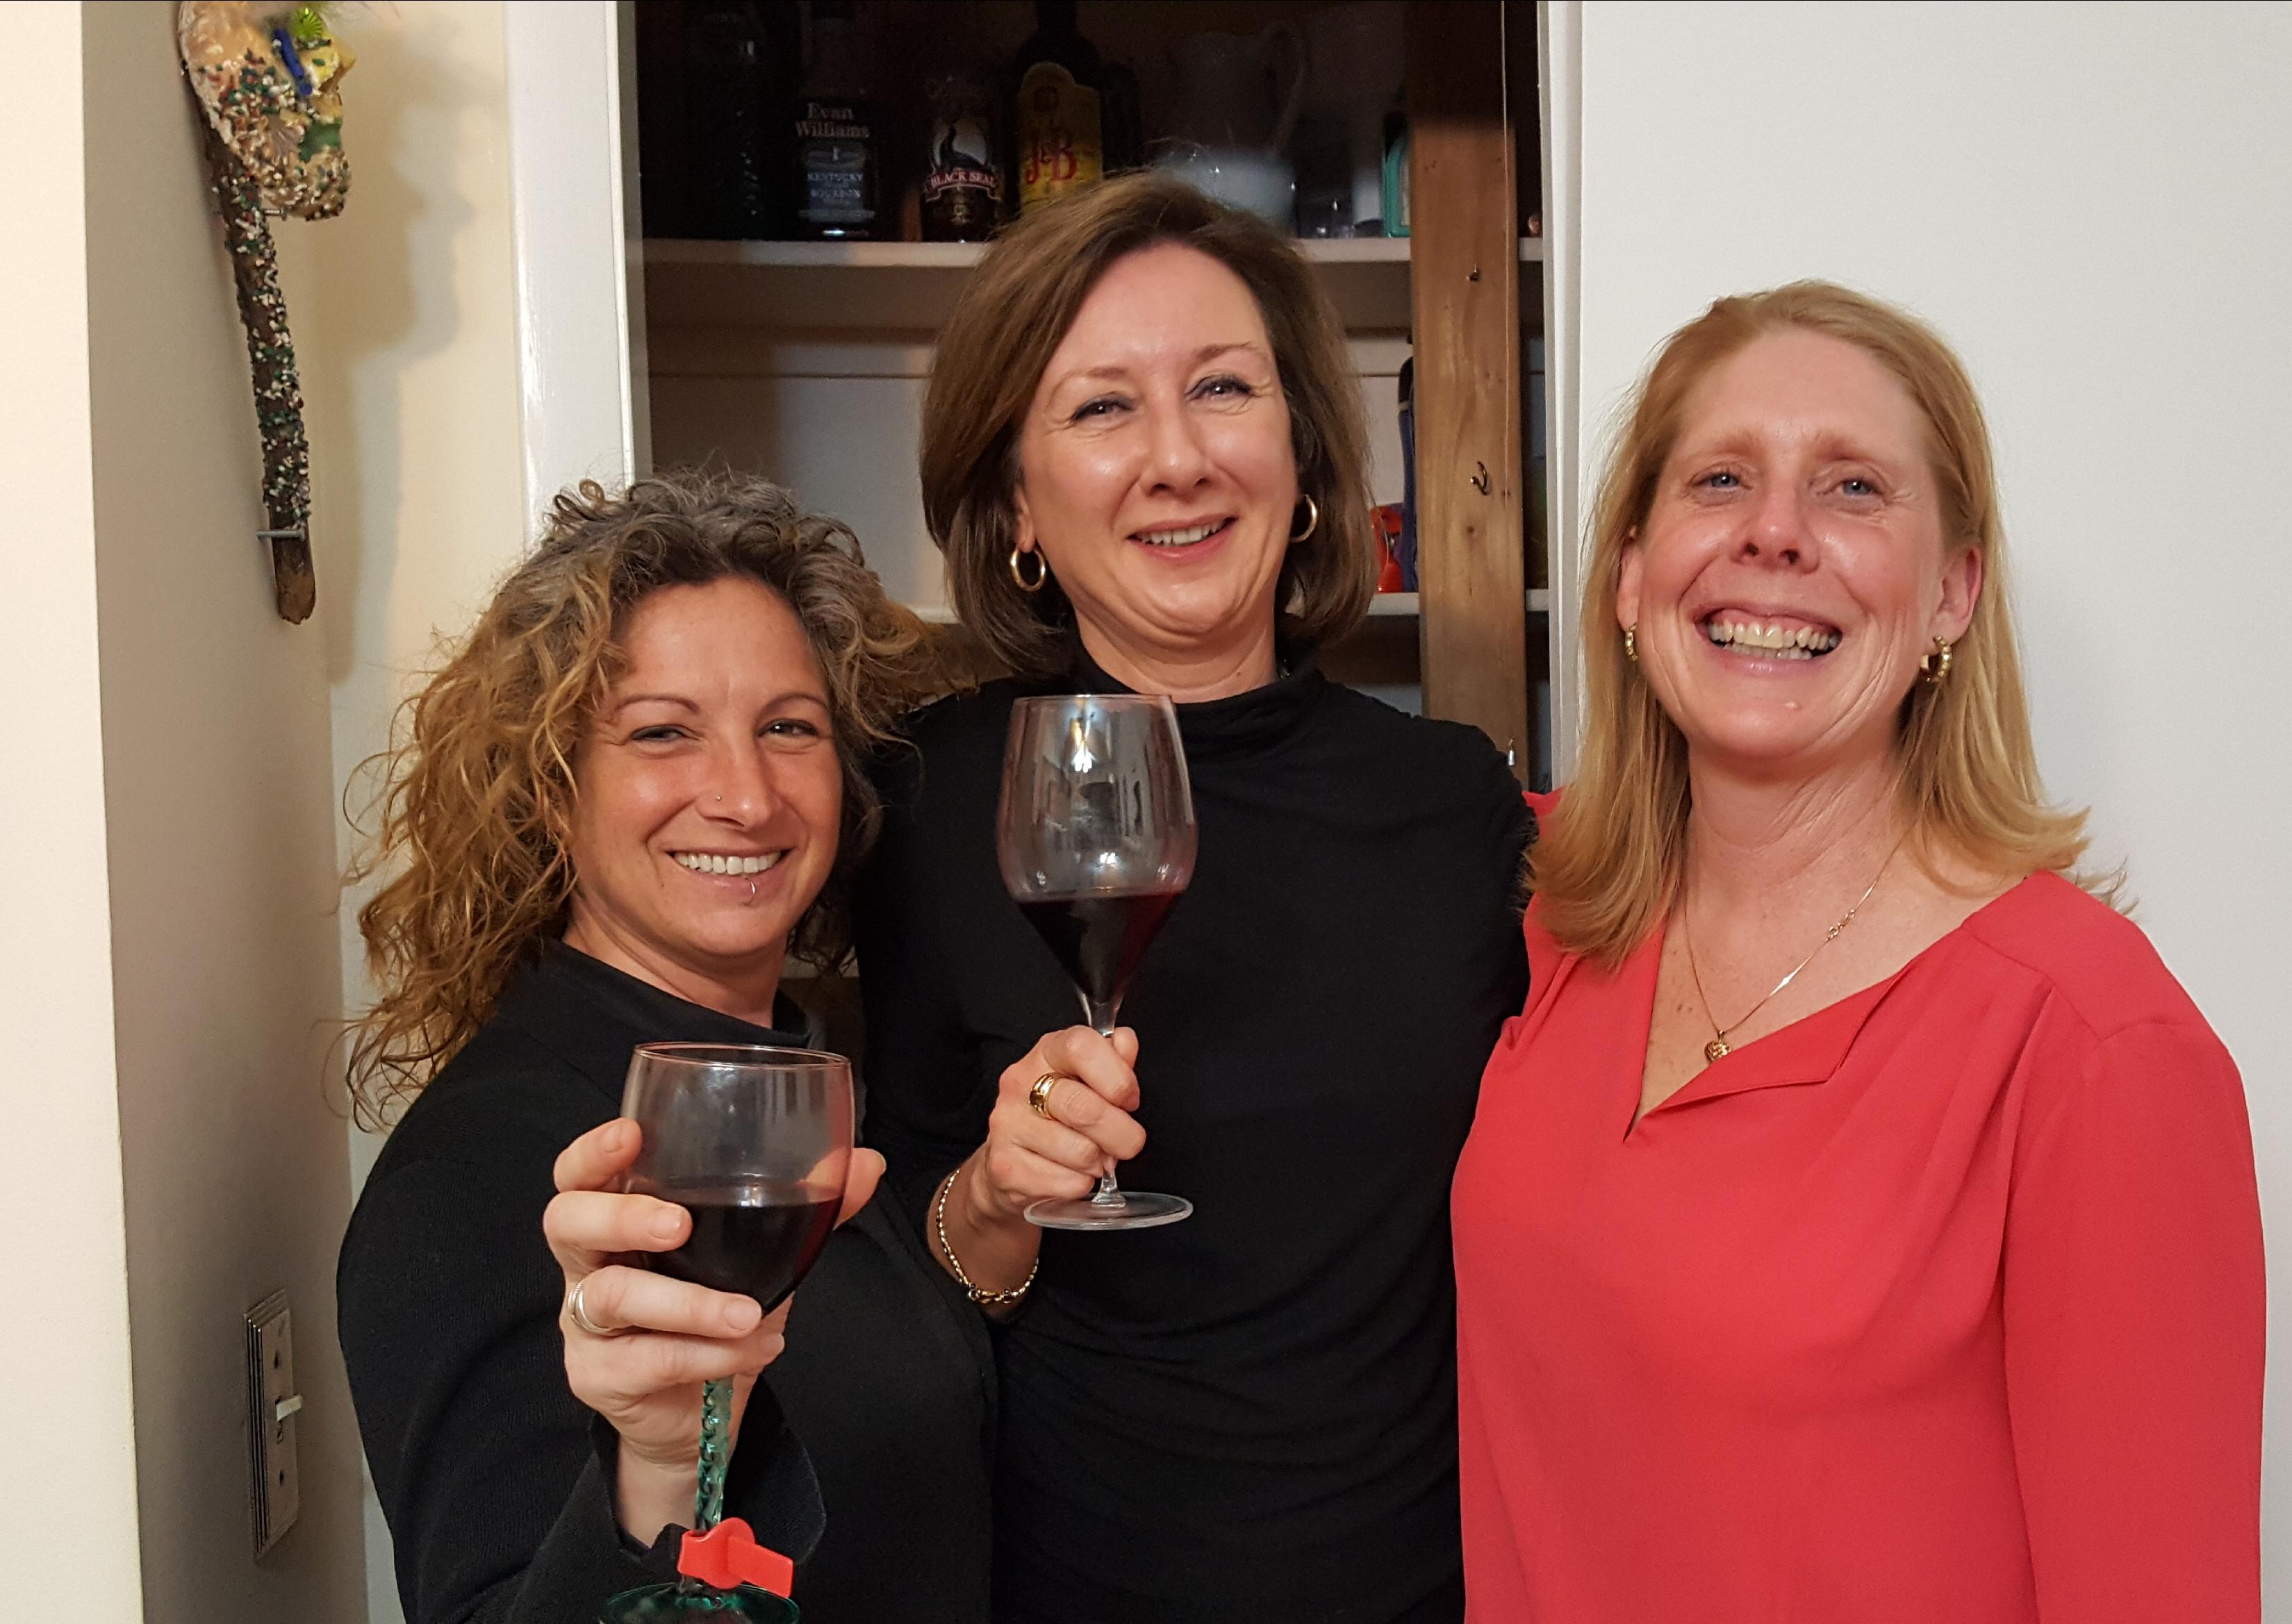 My wonderful work friends. Love these women! Photo by Dragonfly Leathrum